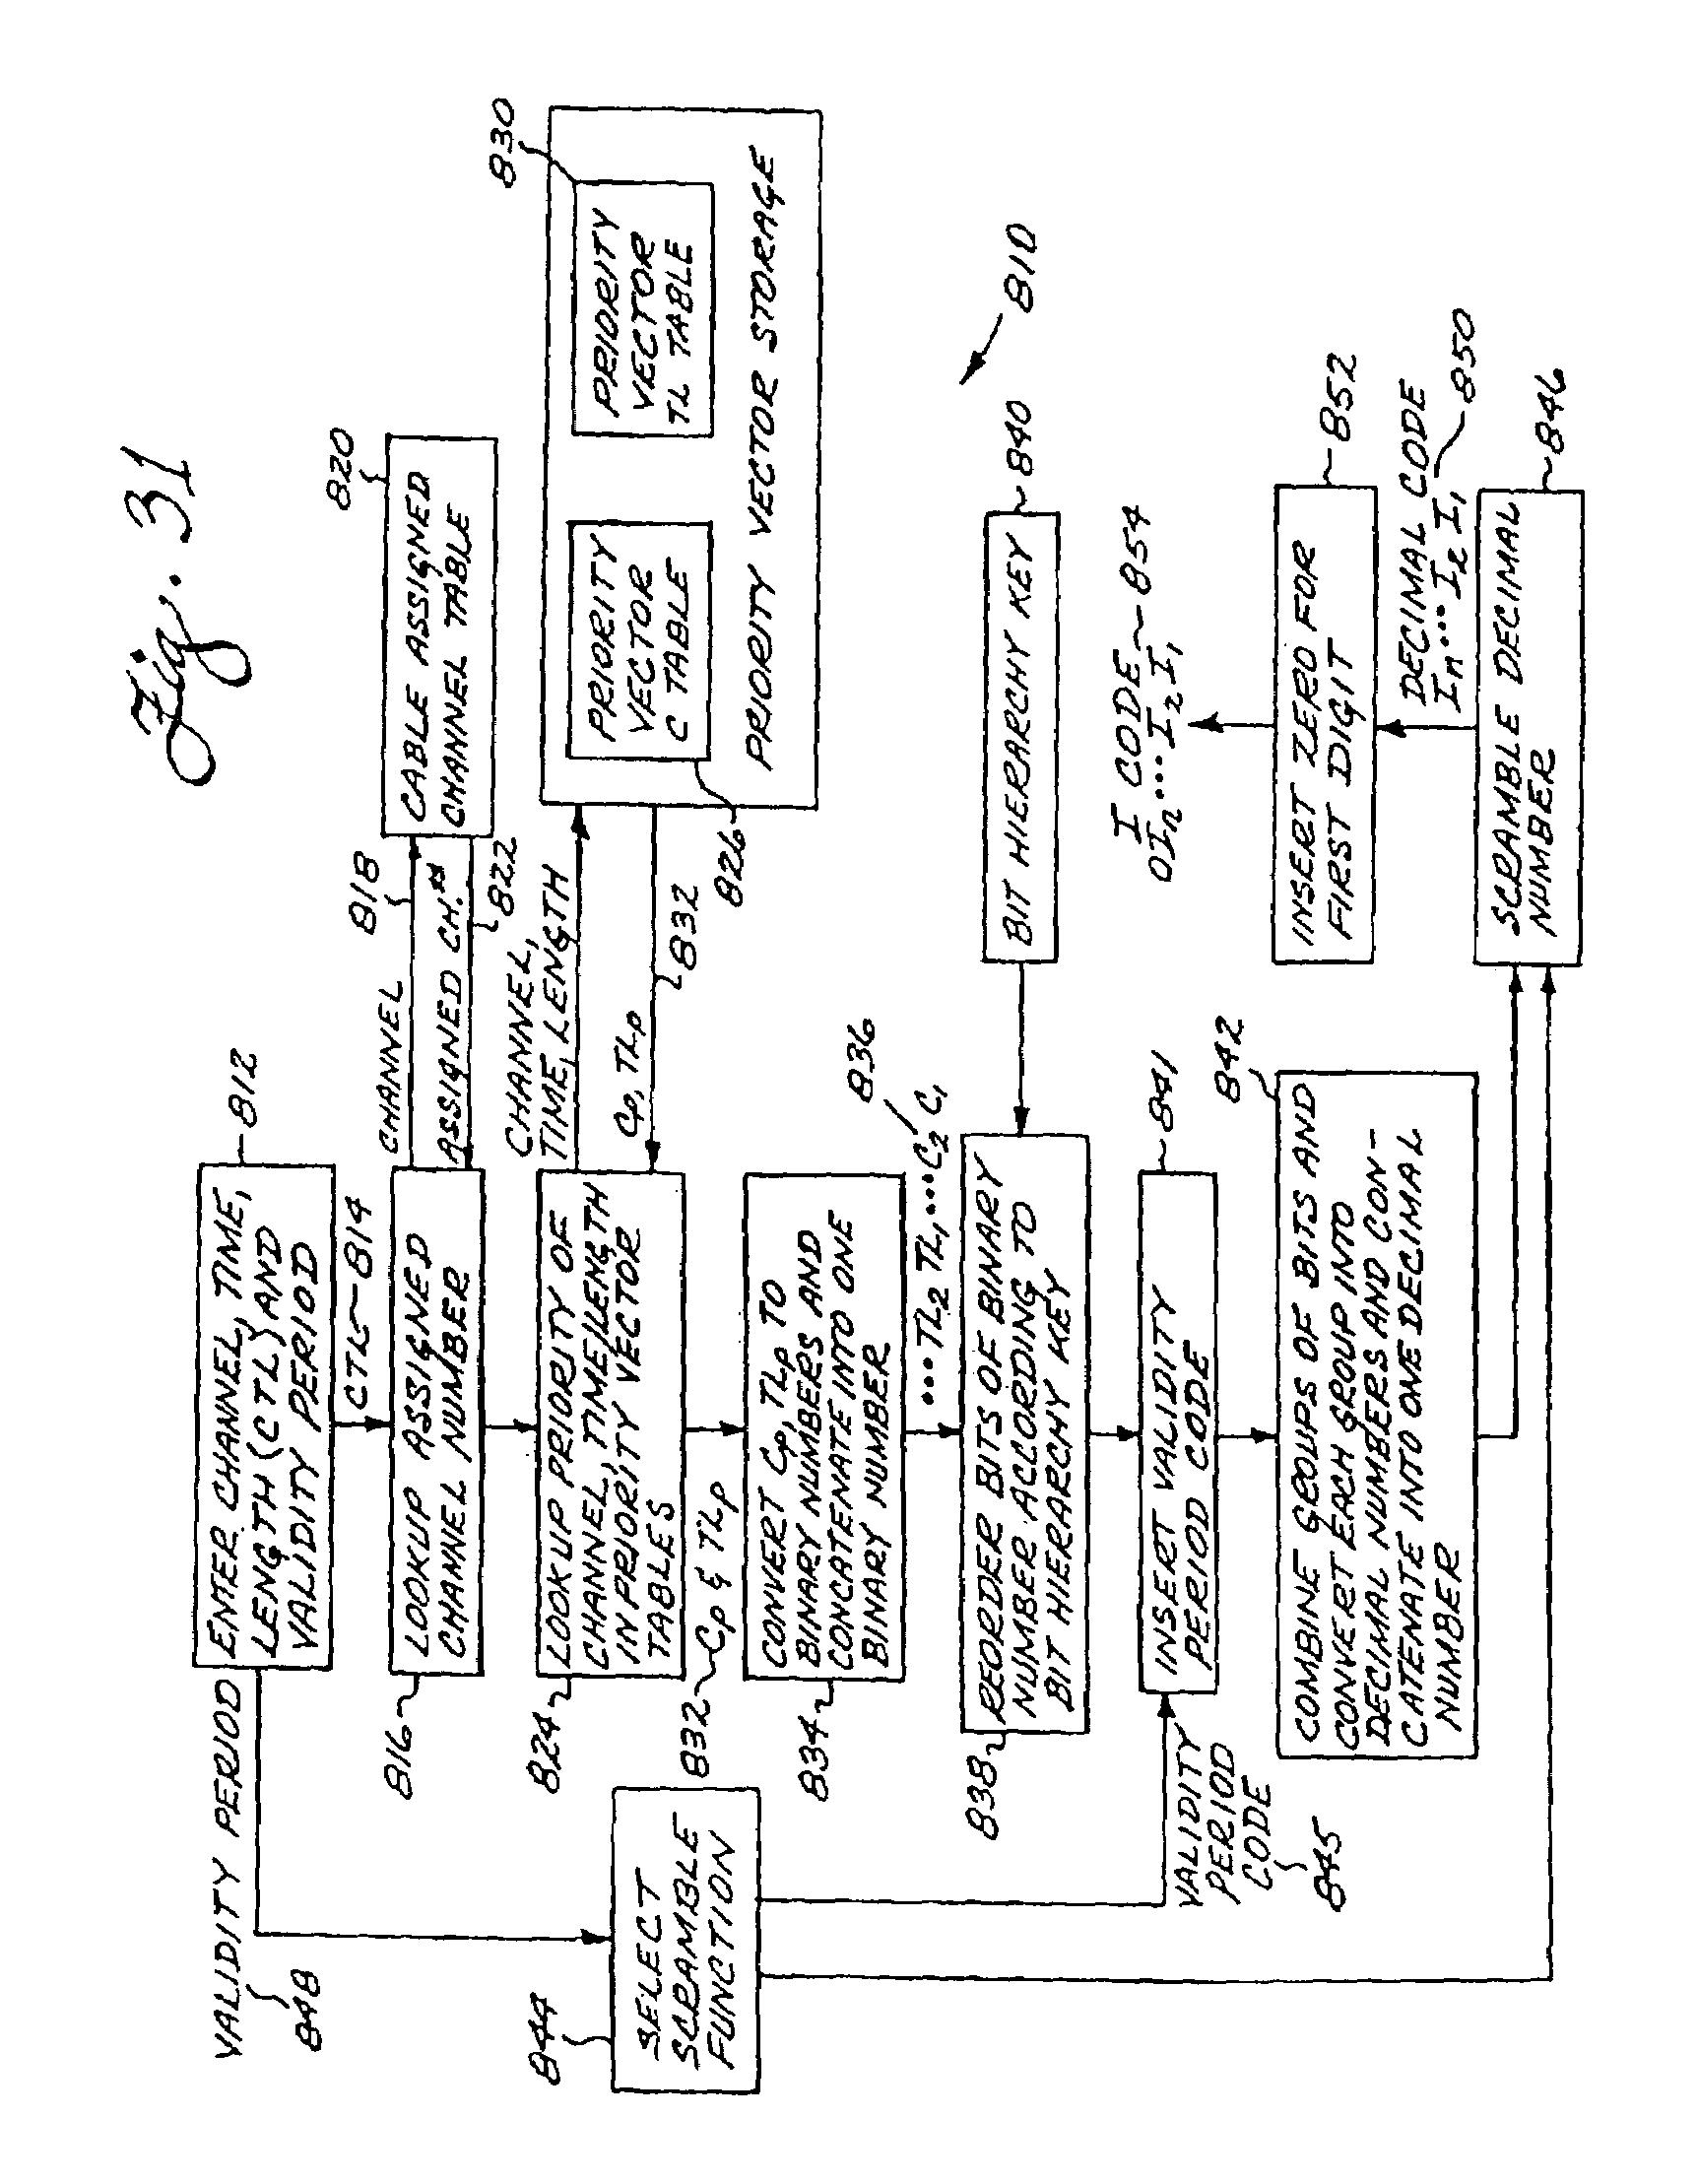 patente us7239798